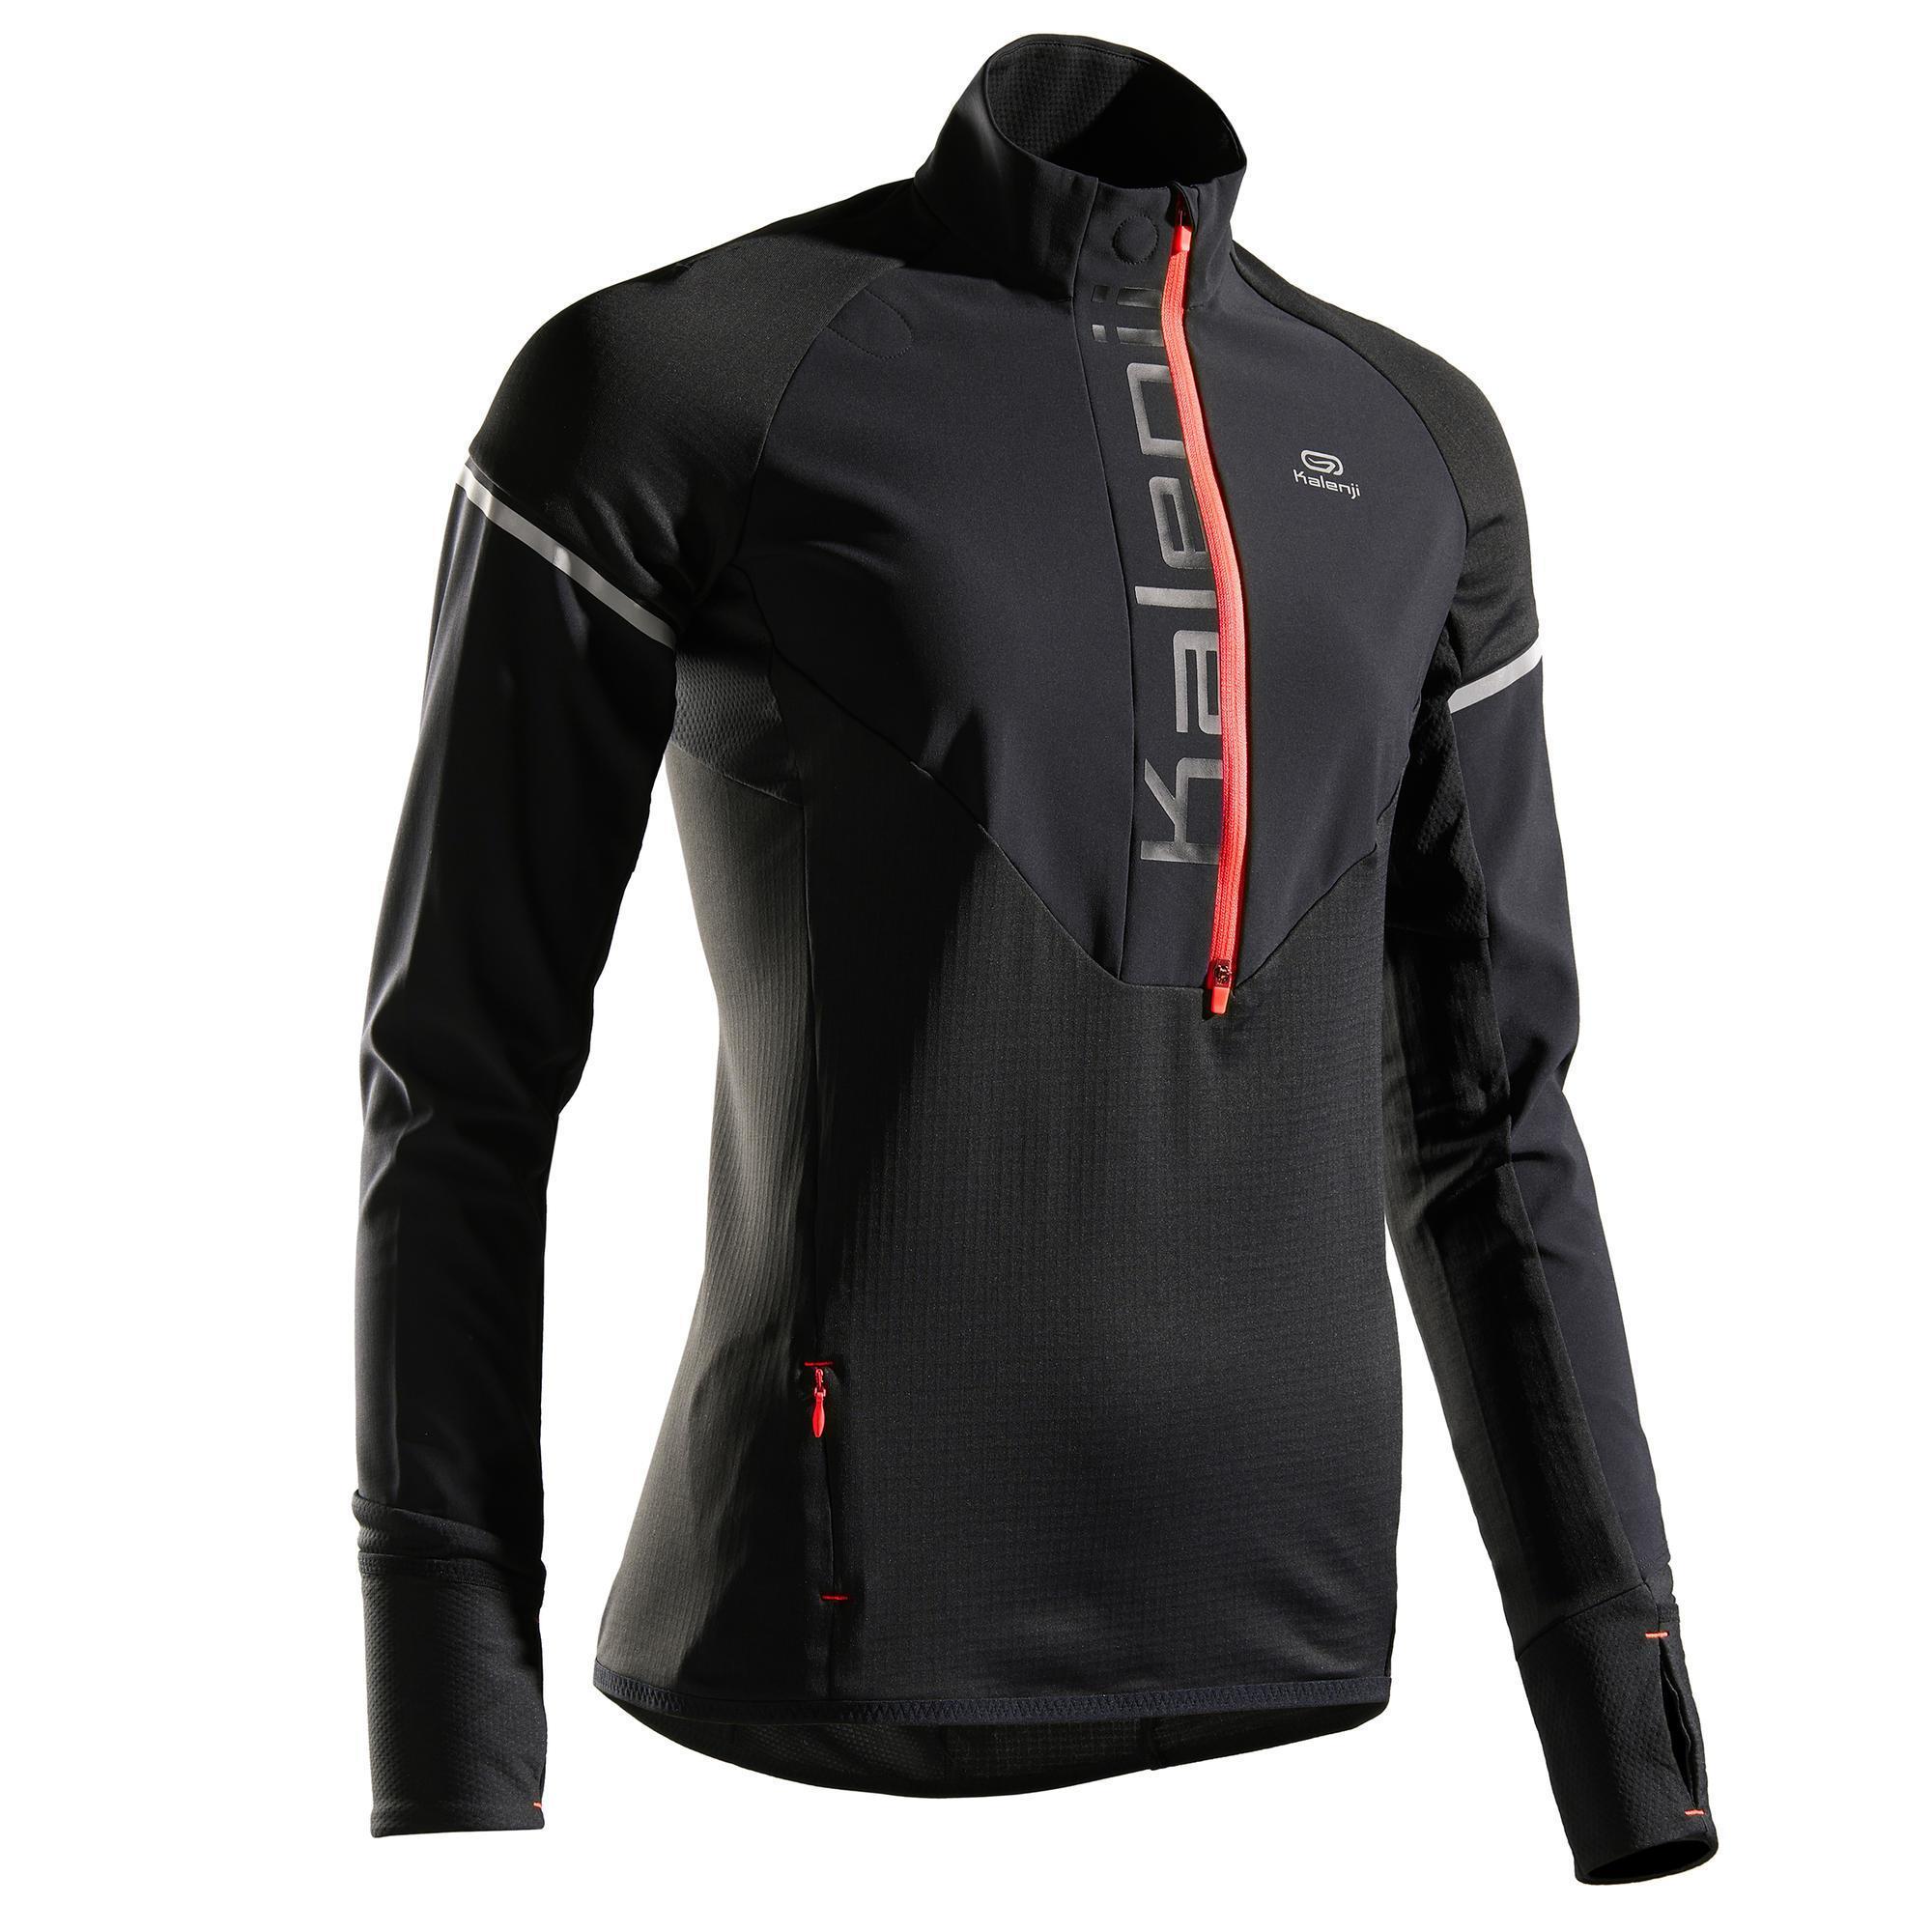 Laufshirt Langarm Kiprun Warm Regul Damen schwarz/koralle | Sportbekleidung > Sportshirts > Laufshirts | Schwarz | Kalenji